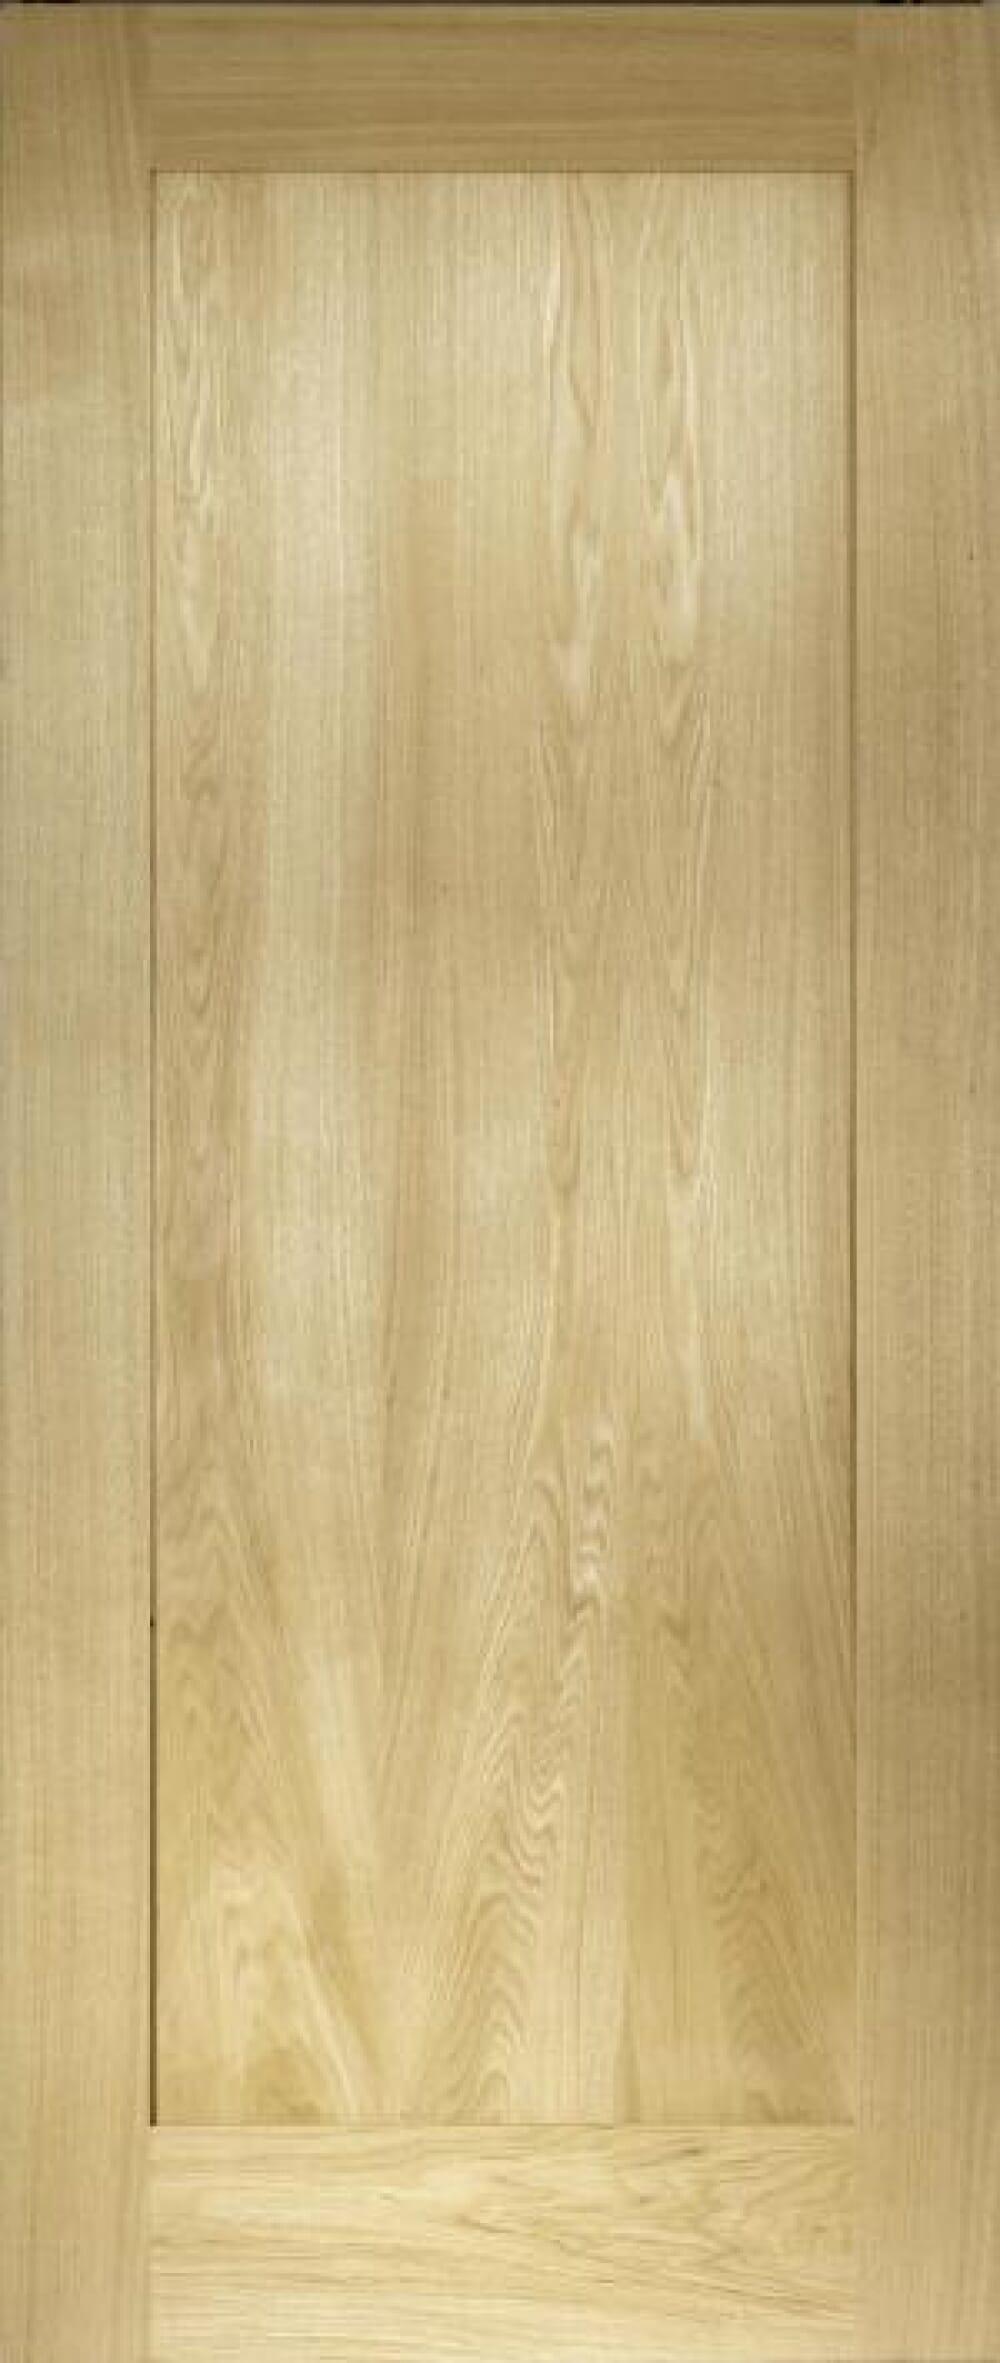 Oak Shaker 1 Panel - Prefinished Image